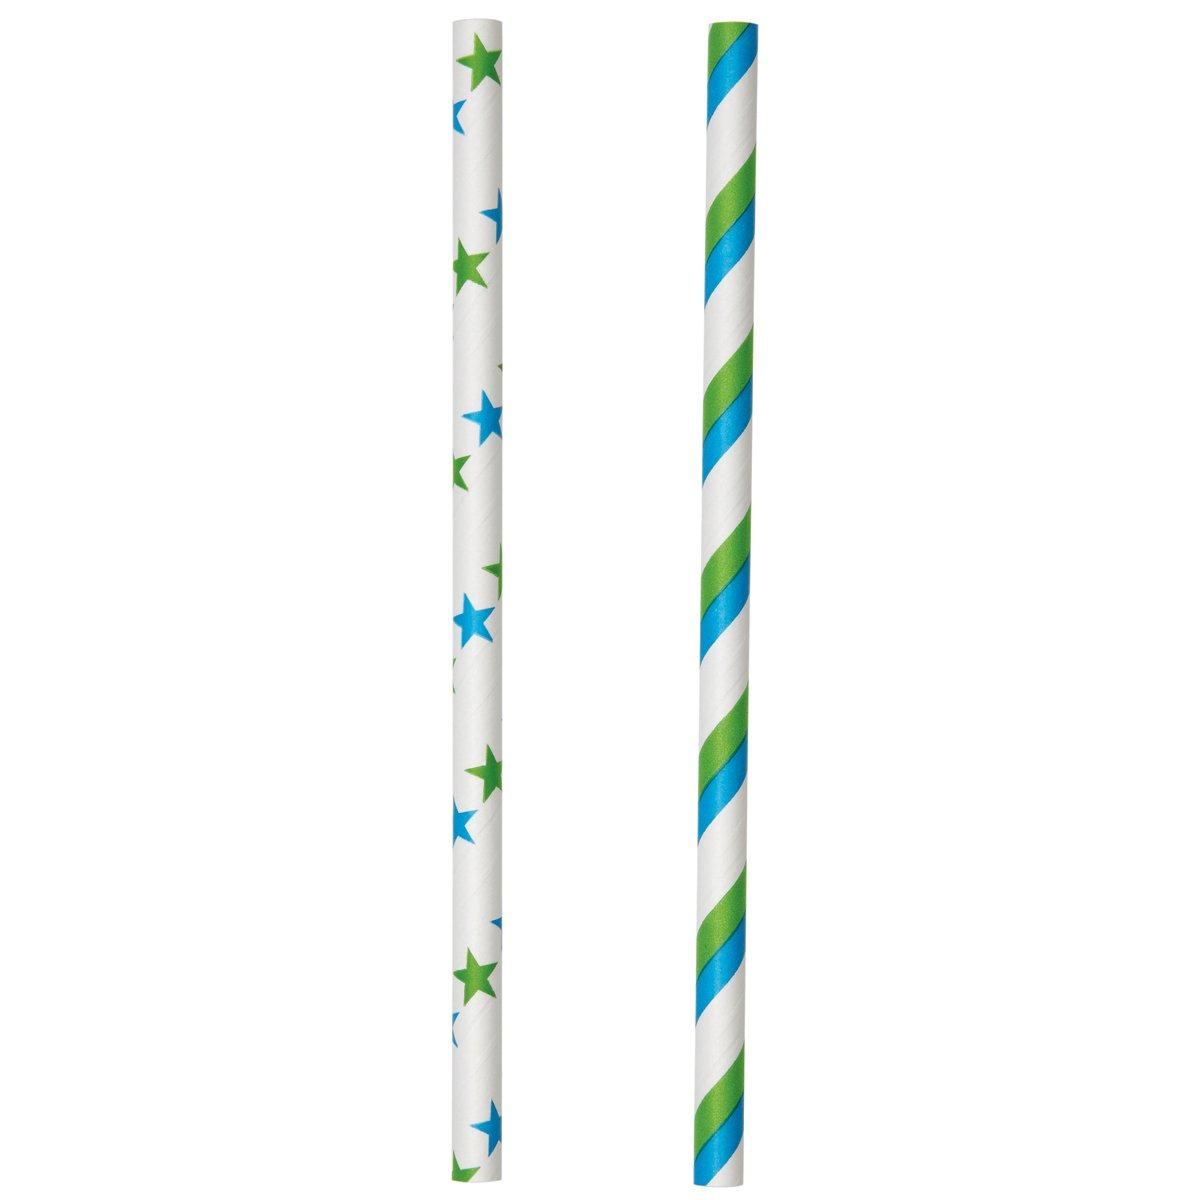 Wilton 1912-4000 Colored Lollipop Sticks, Blue/Green